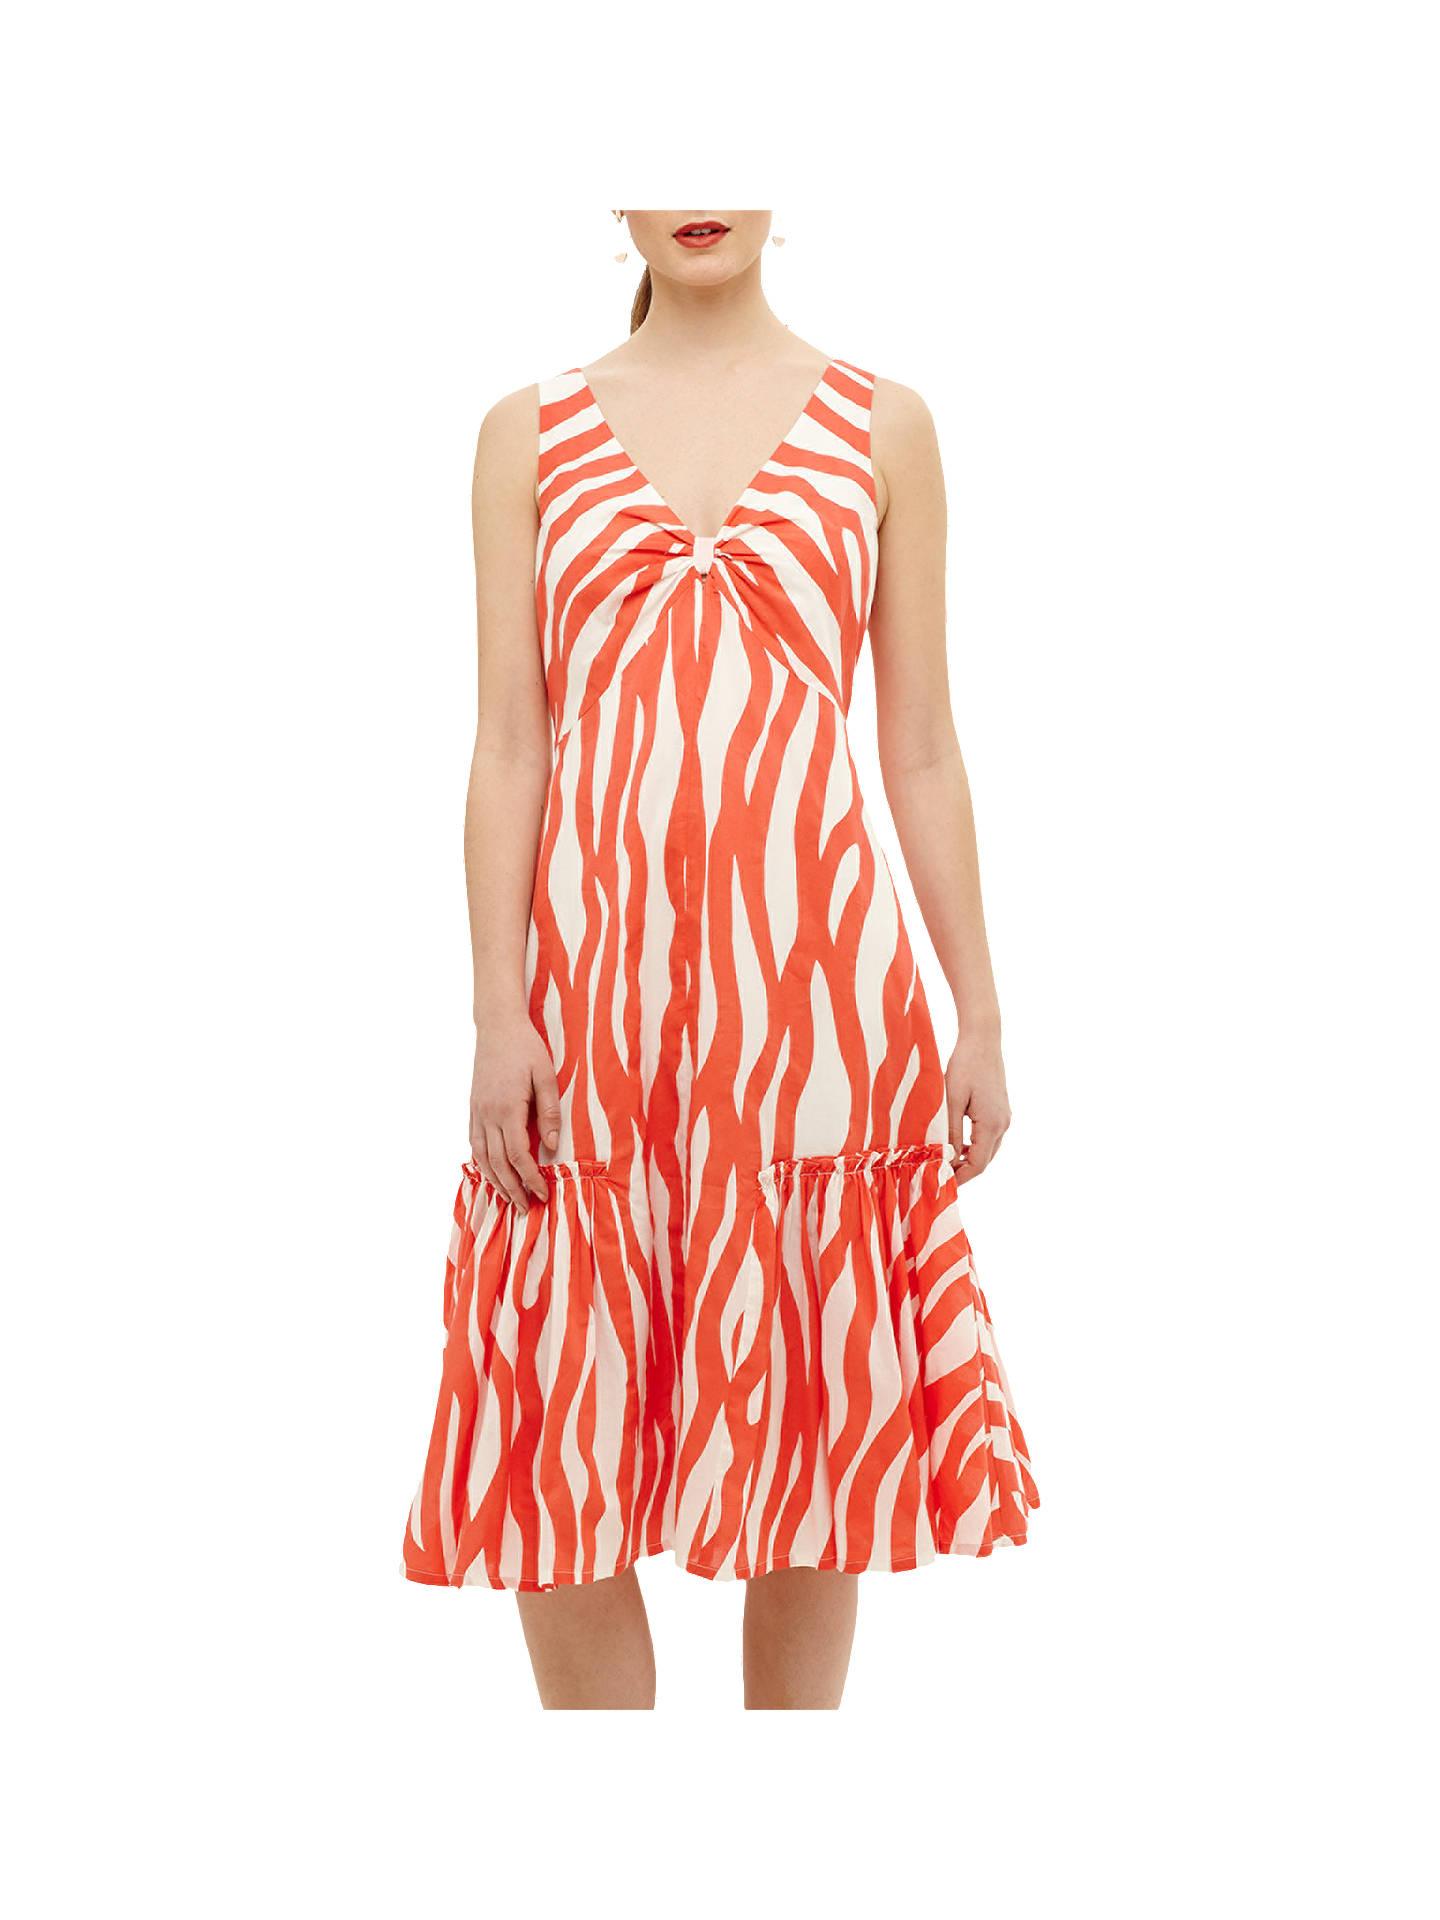 6605a3e511e2f Buy Phase Eight Winona Dress, White/Orange, 8 Online at johnlewis.com ...